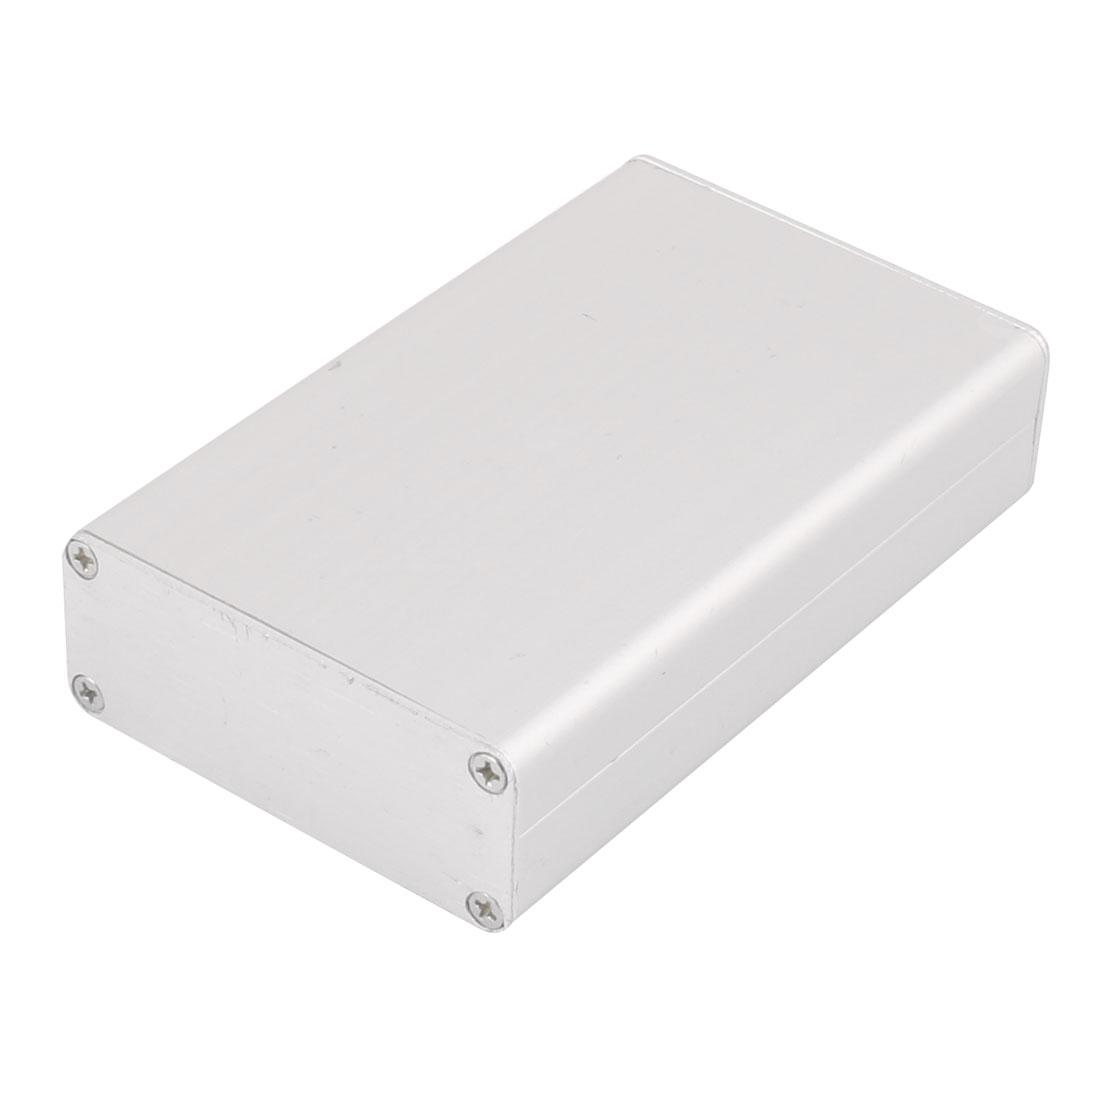 82 x 50 x 20mm Multi-purpose Electronic Extruded Aluminum Enclosure Silver Tone